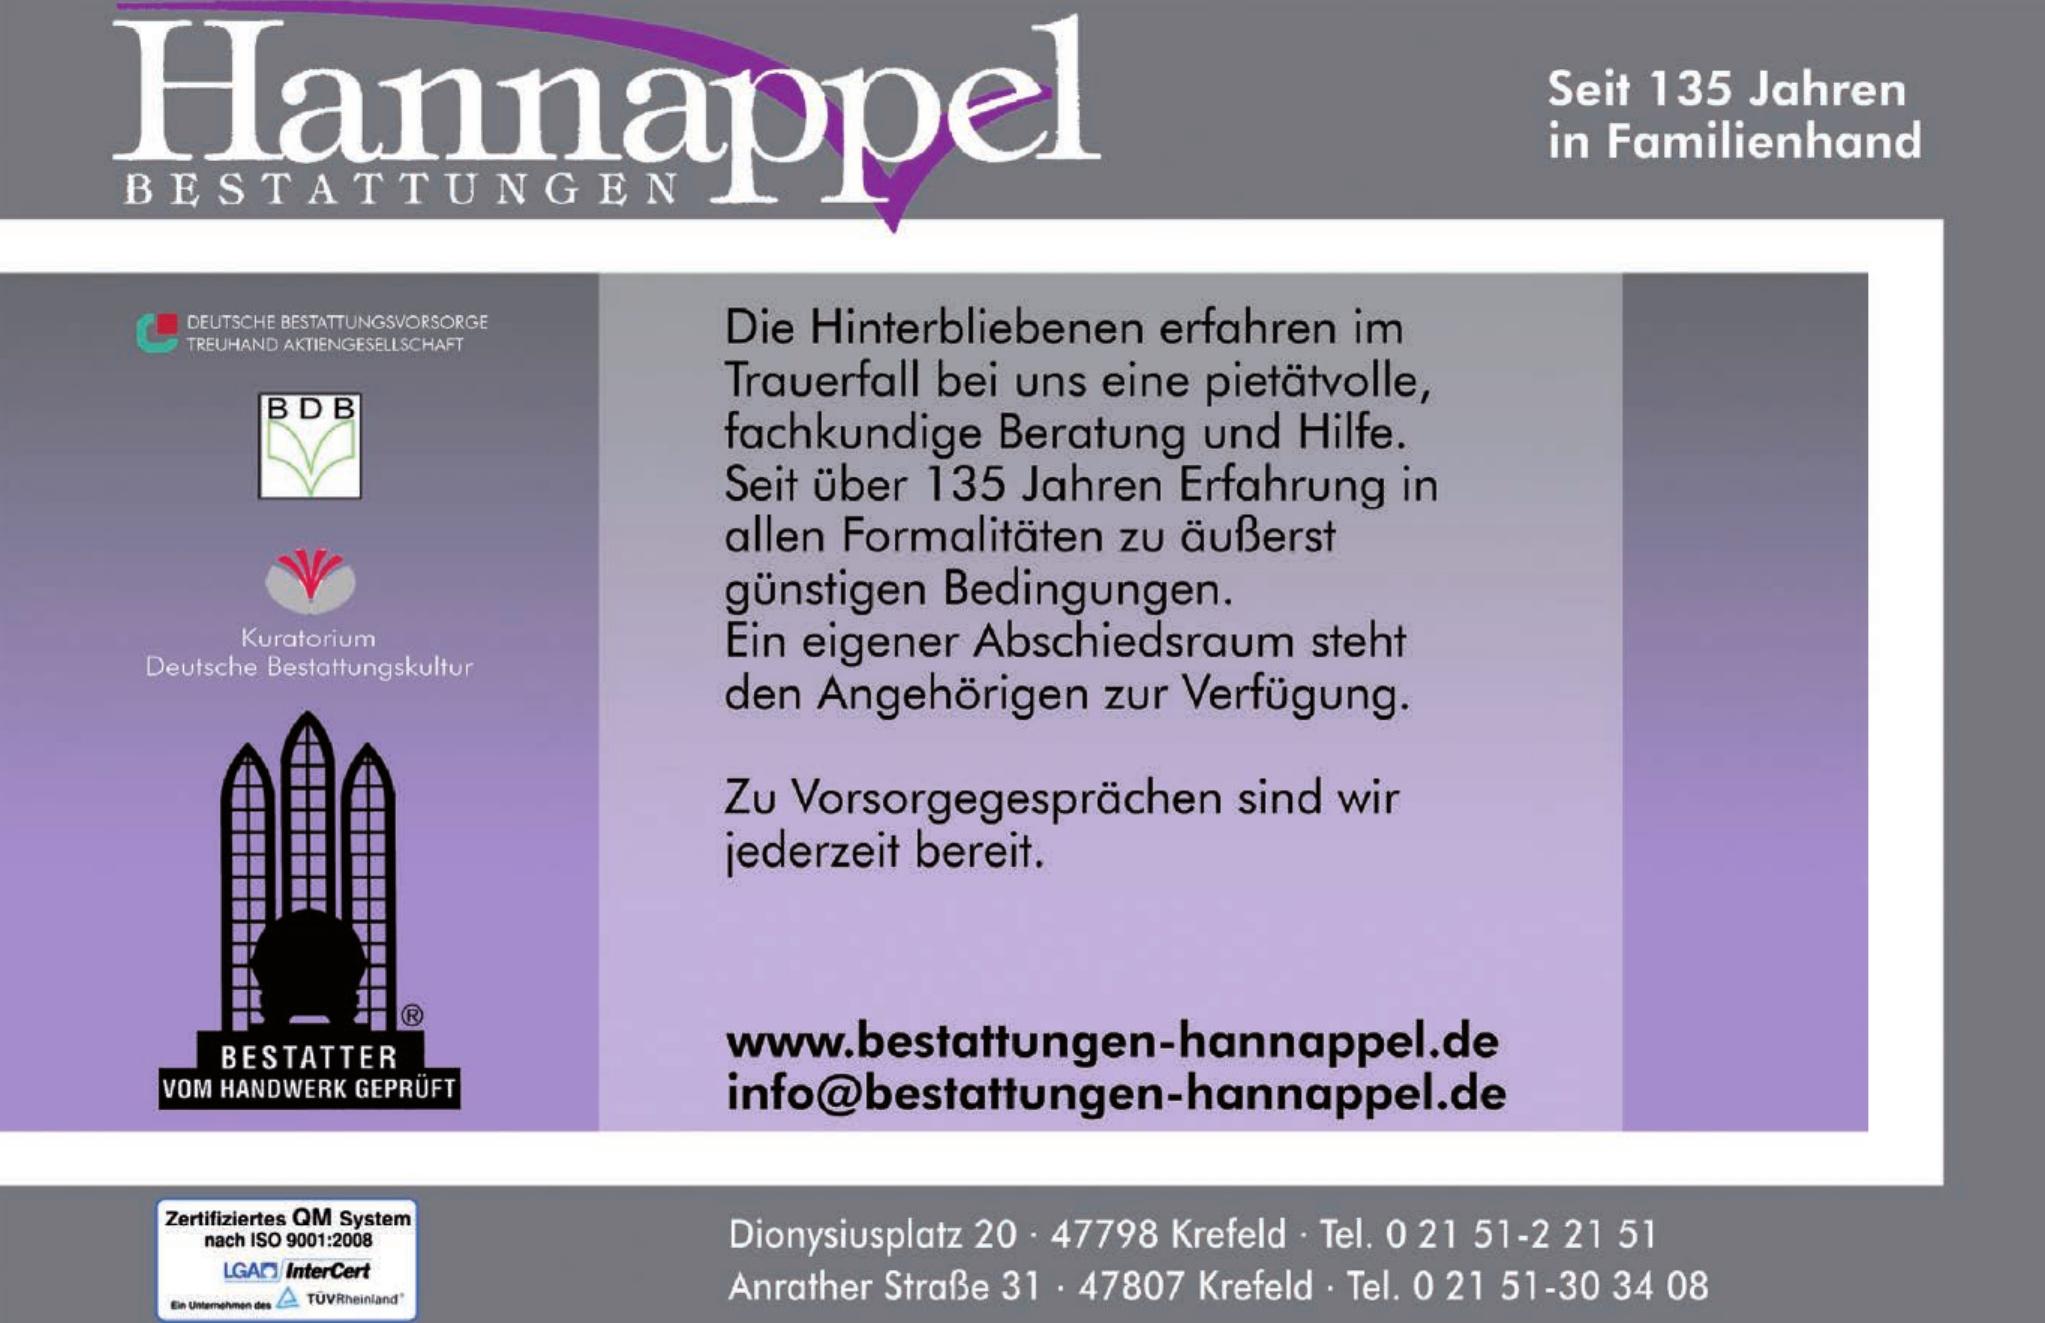 Hermann Hannappel & Sohn Bestattungen